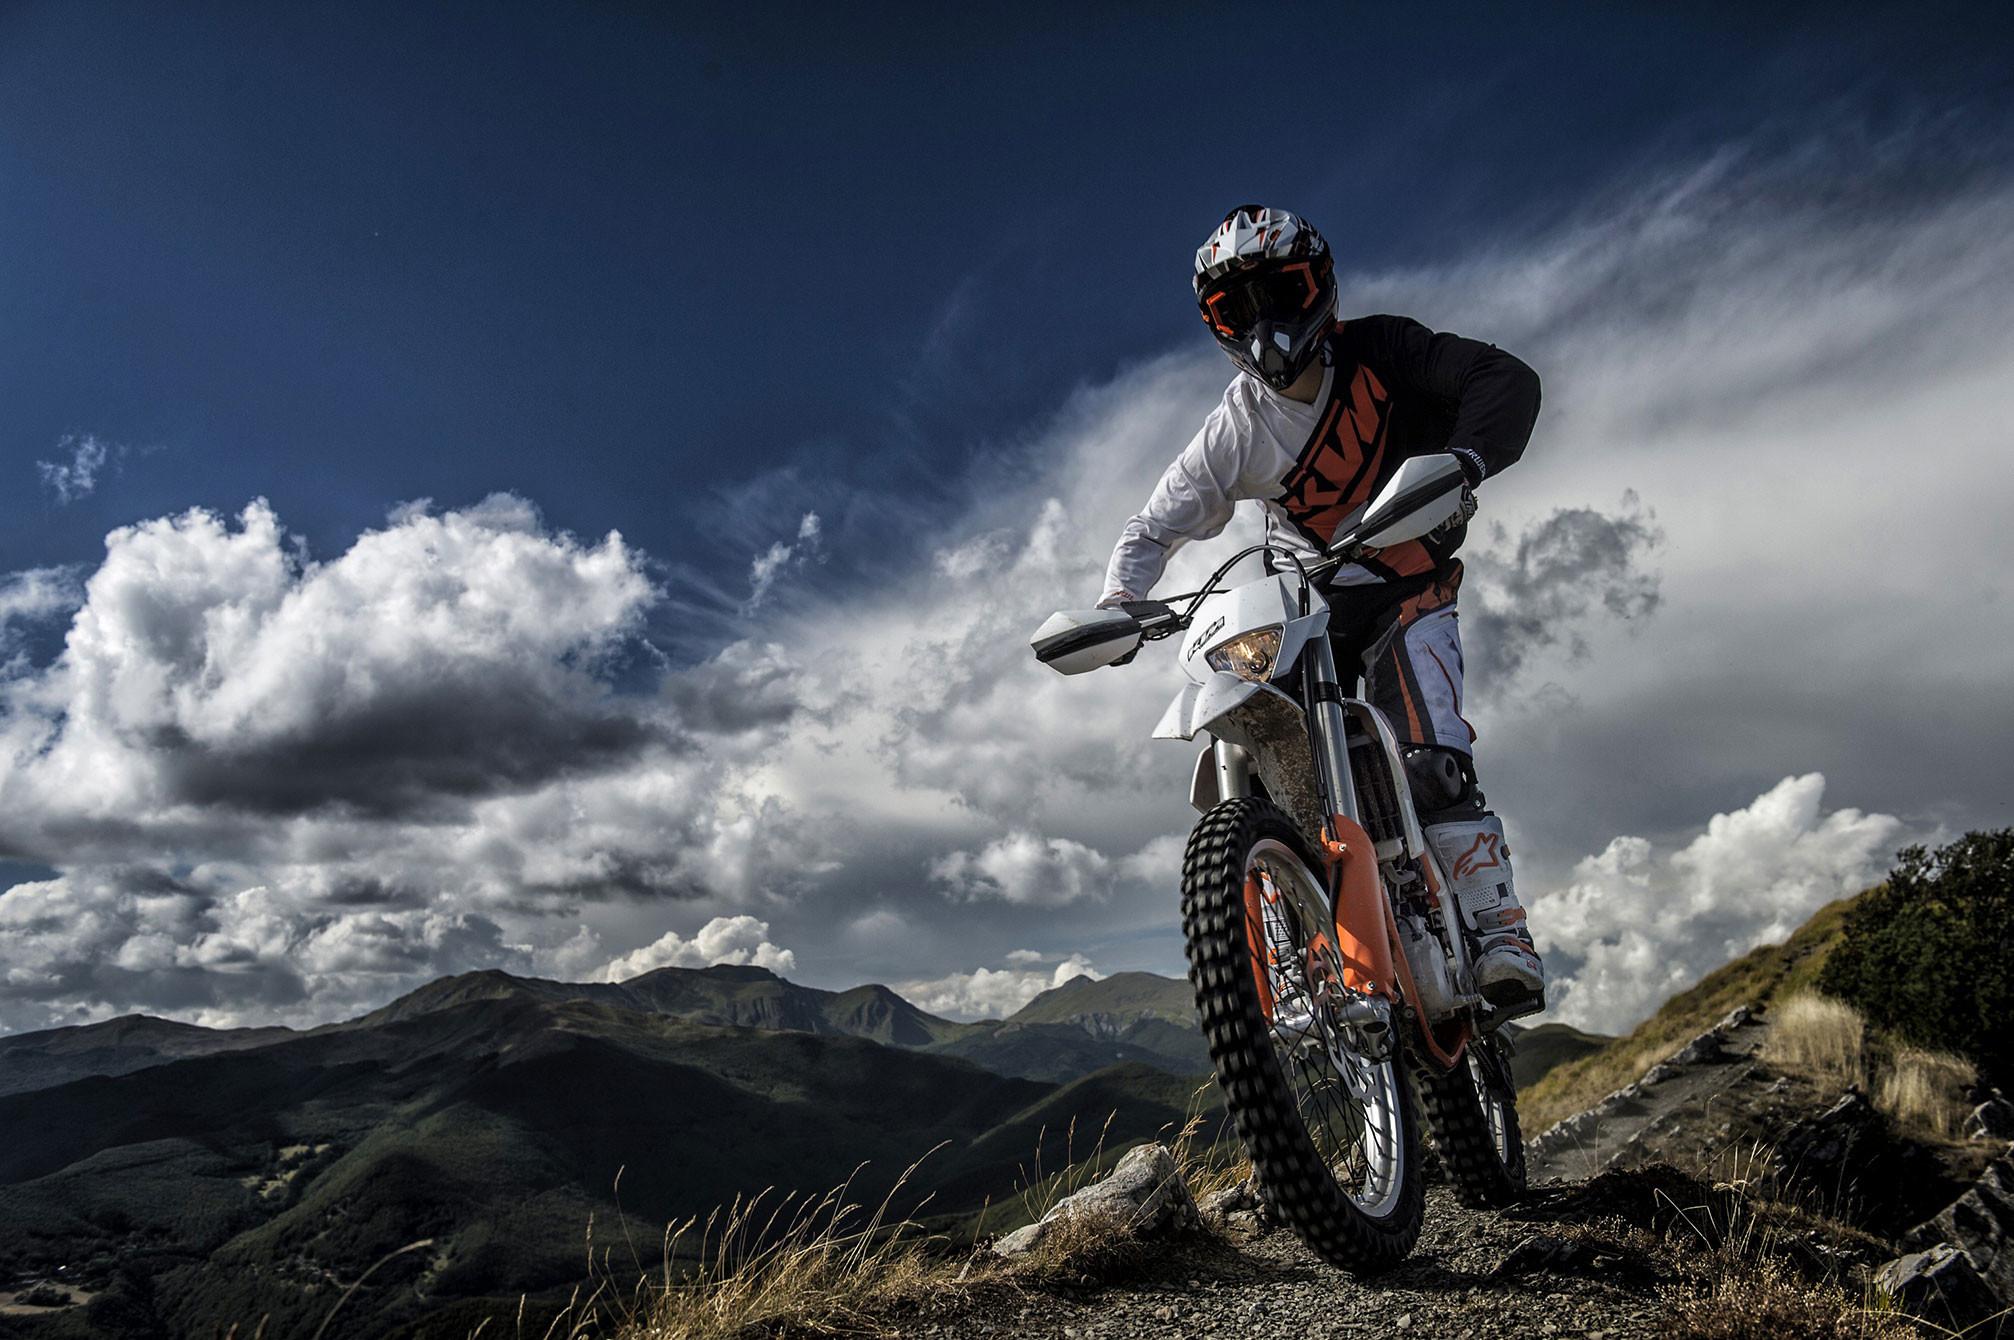 HD Motocross Ktm Backgrounds | PixelsTalk.Net